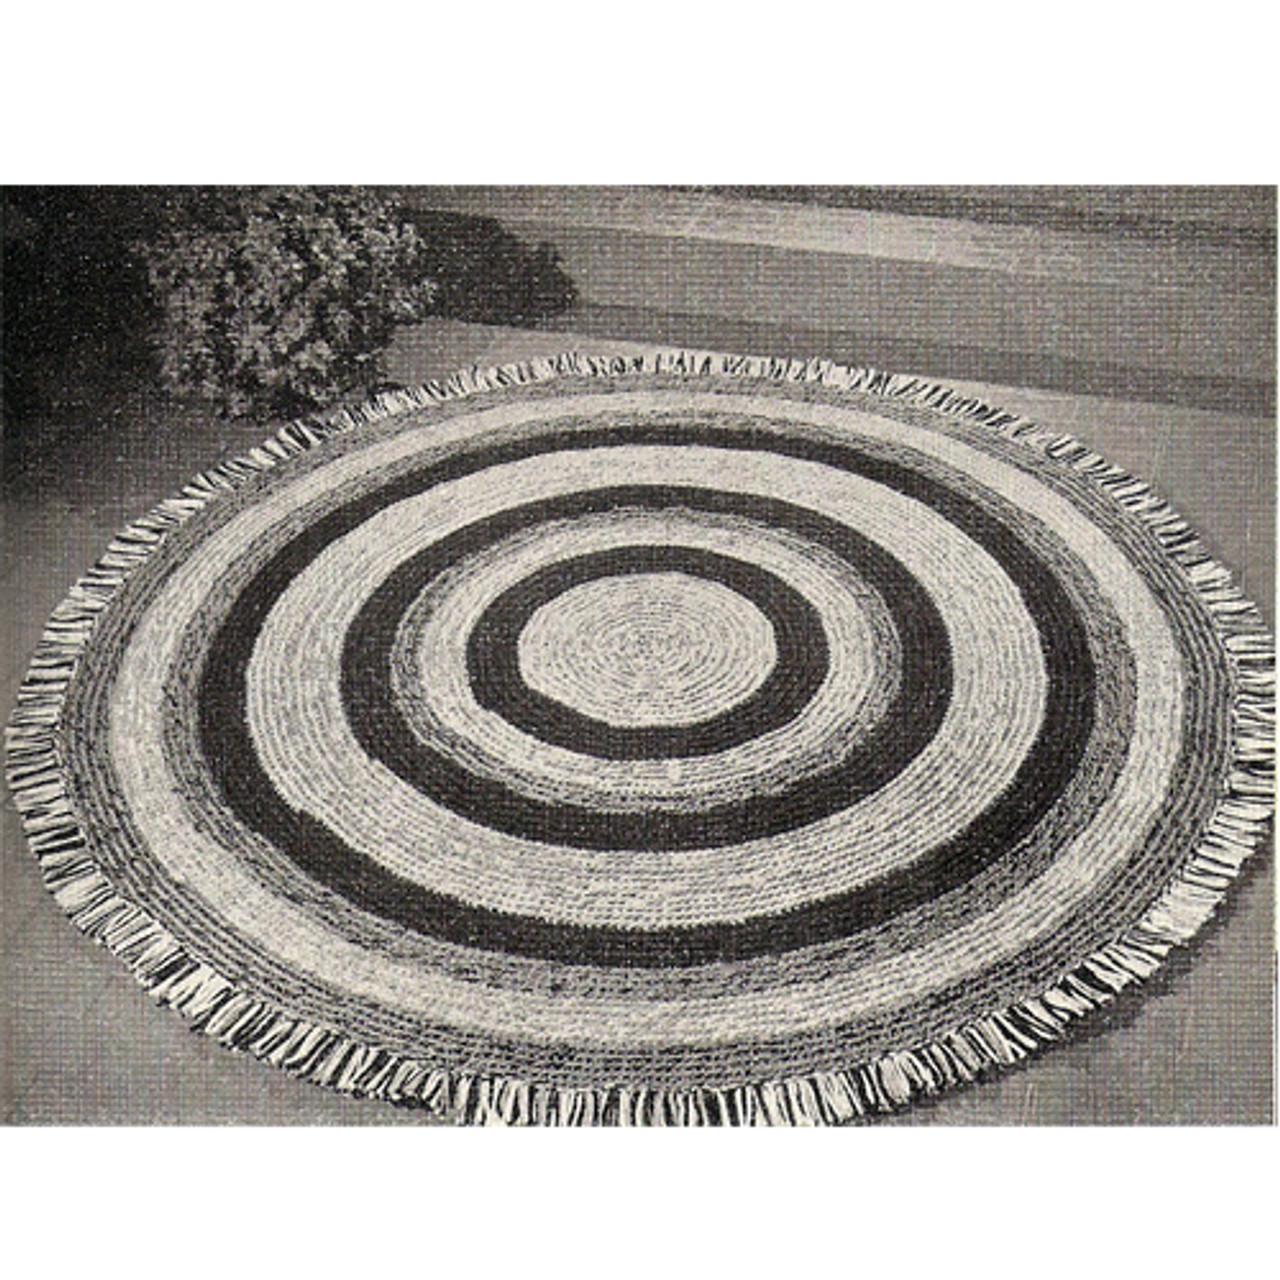 Fringed Round Rug Crochet Pattern